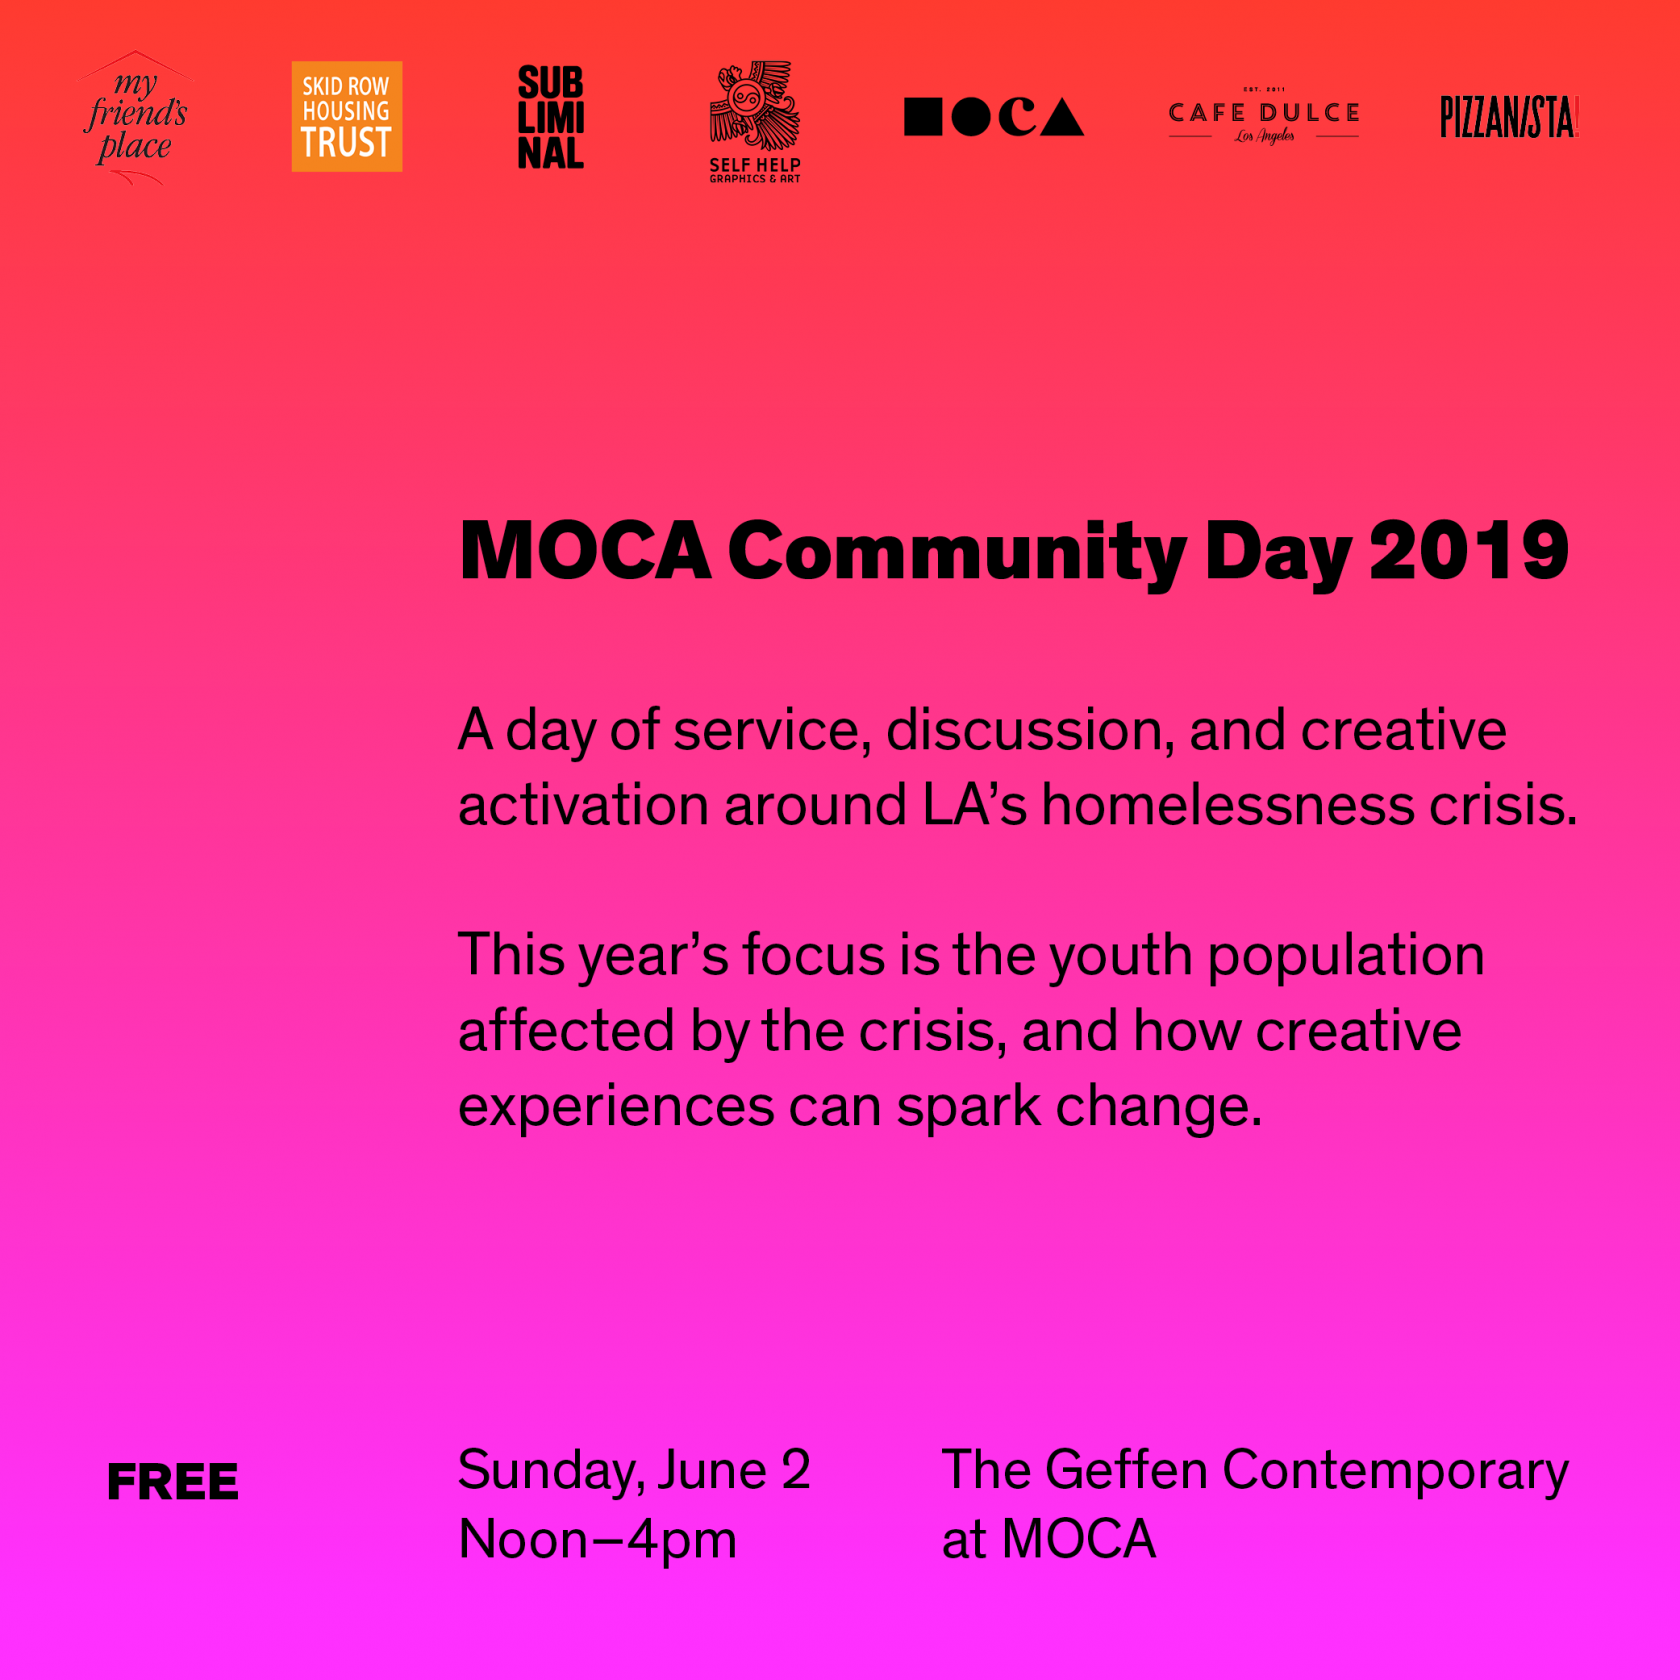 MOCA Community Day 2019